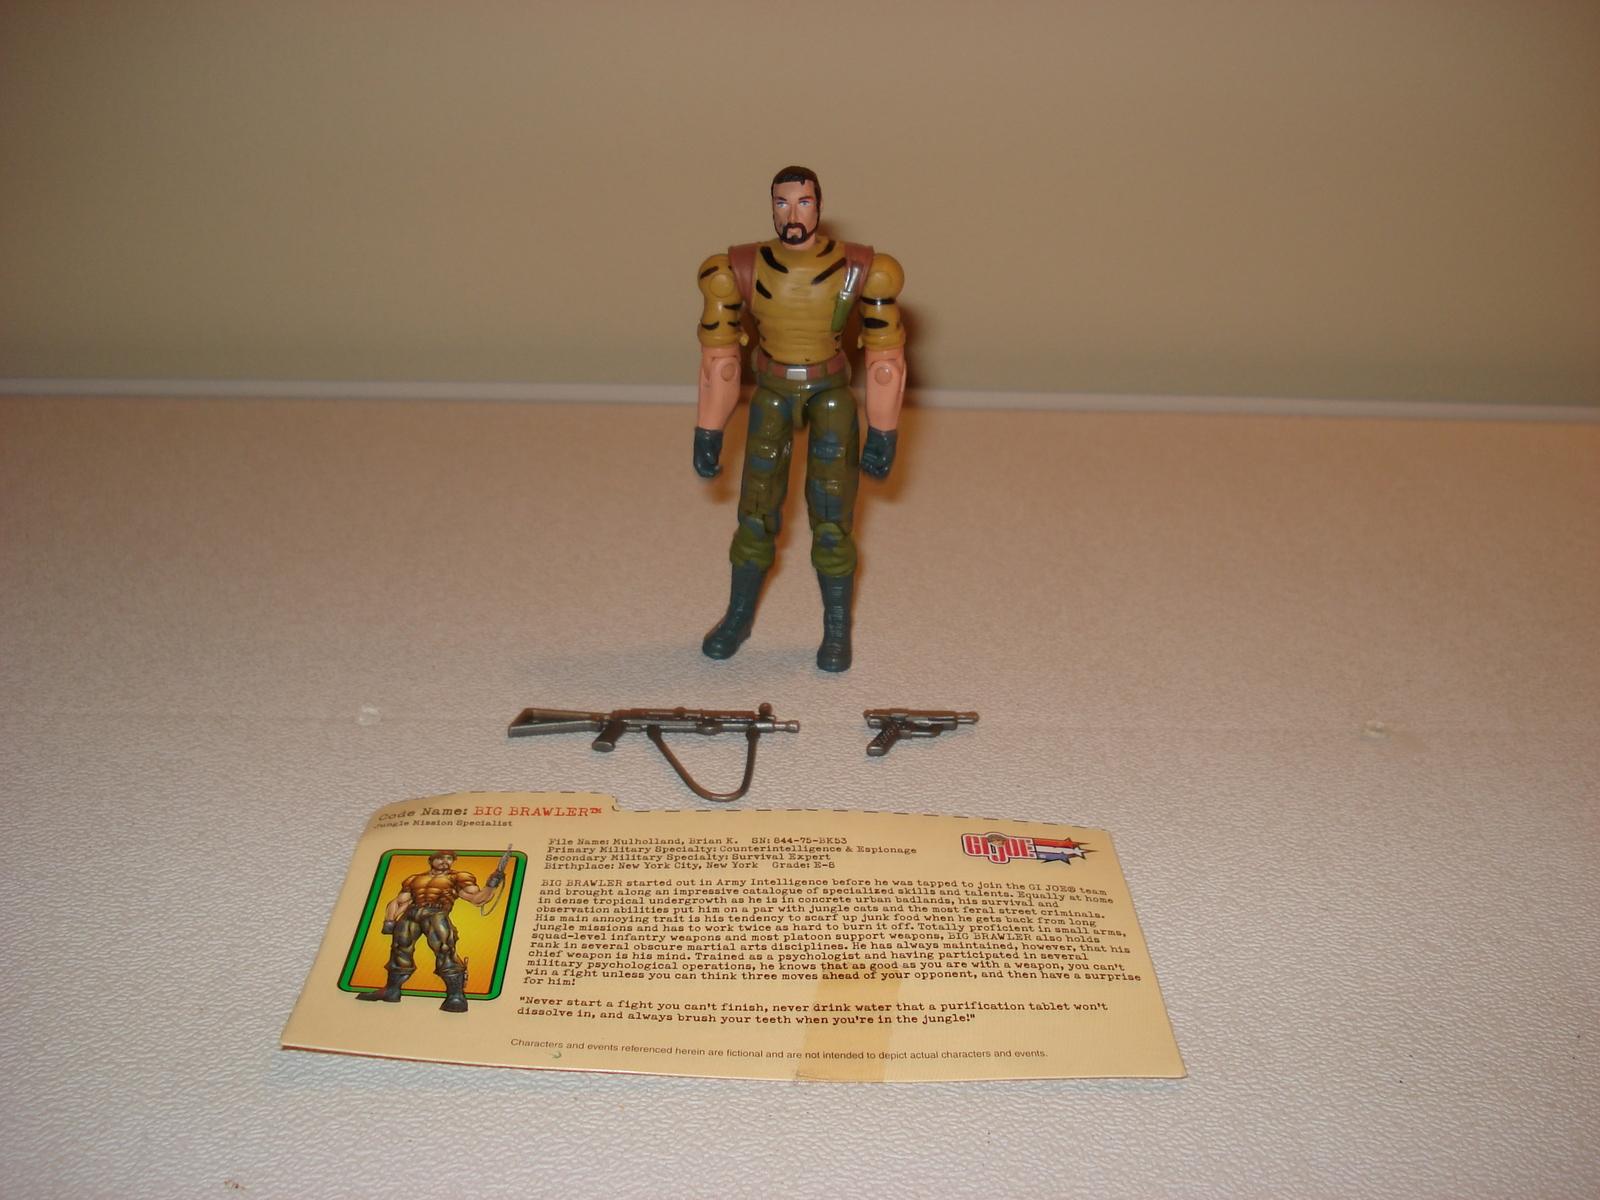 gi joe vs cobra 2003 big brawler spy troops i1 military